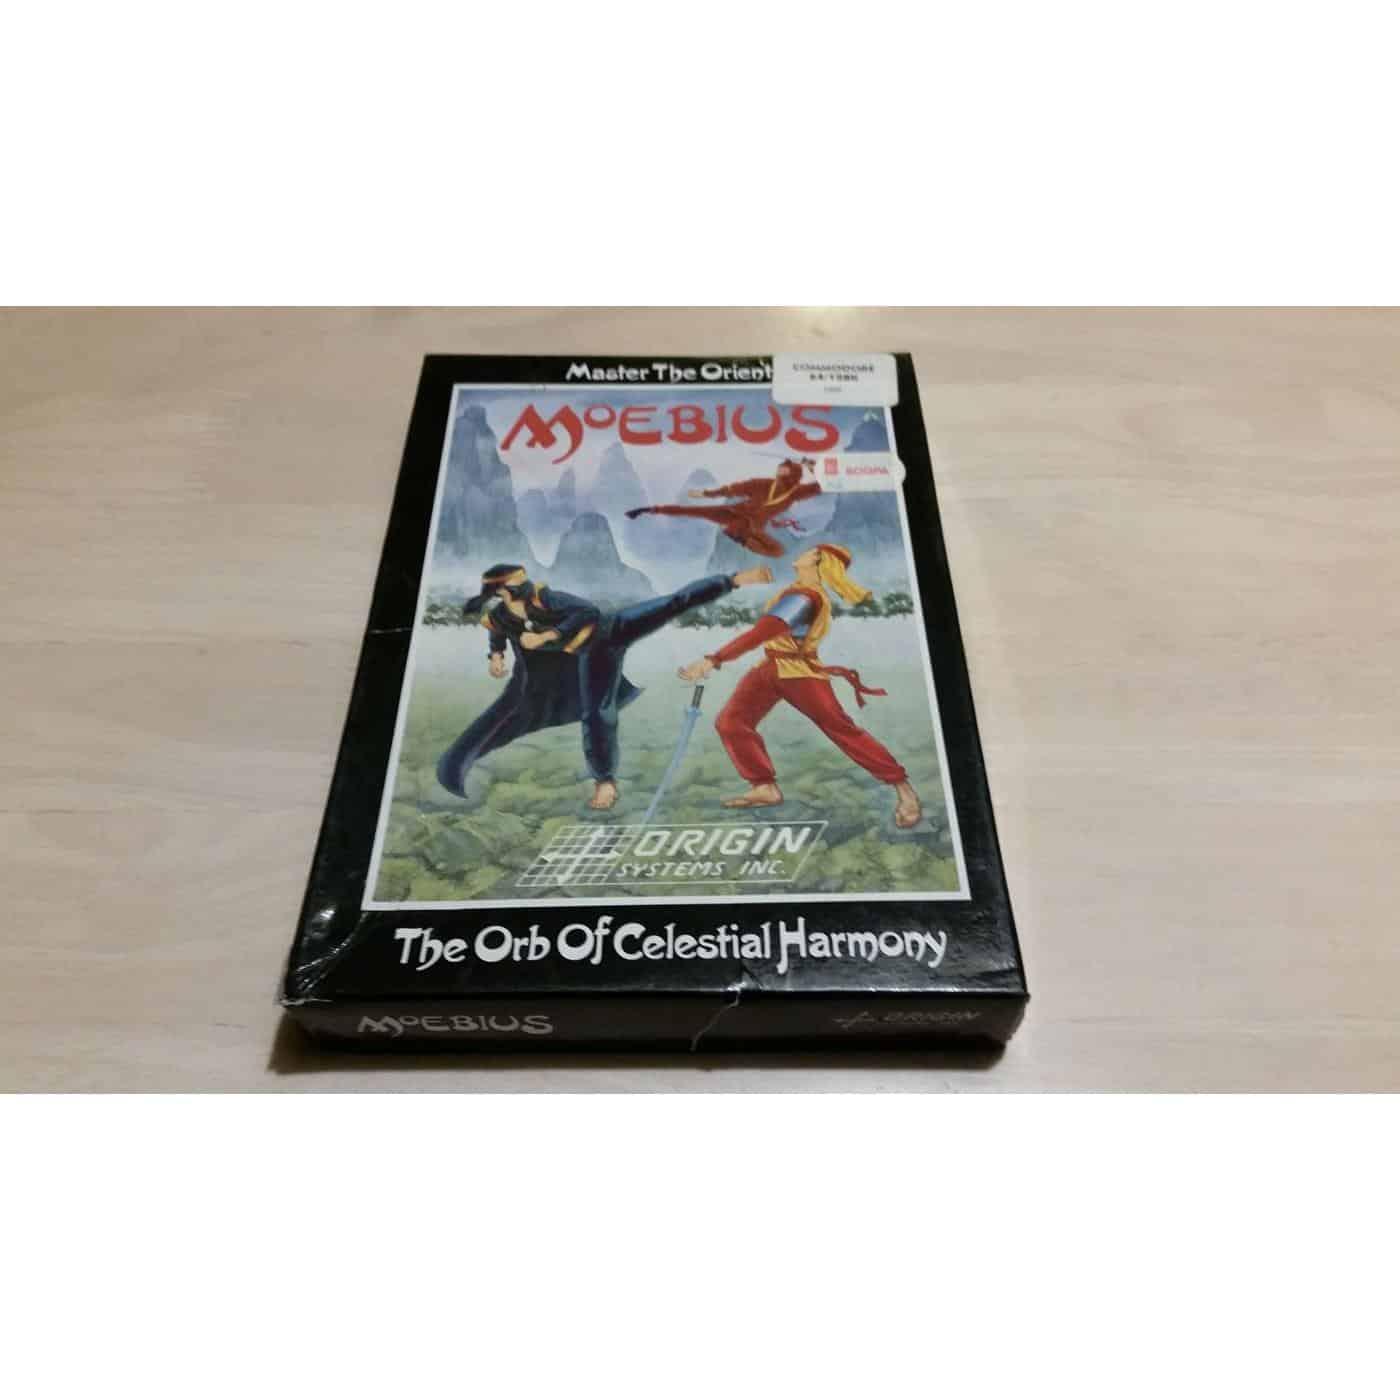 Moebius: The Orb of Celestial Harmony (C64 Disk)